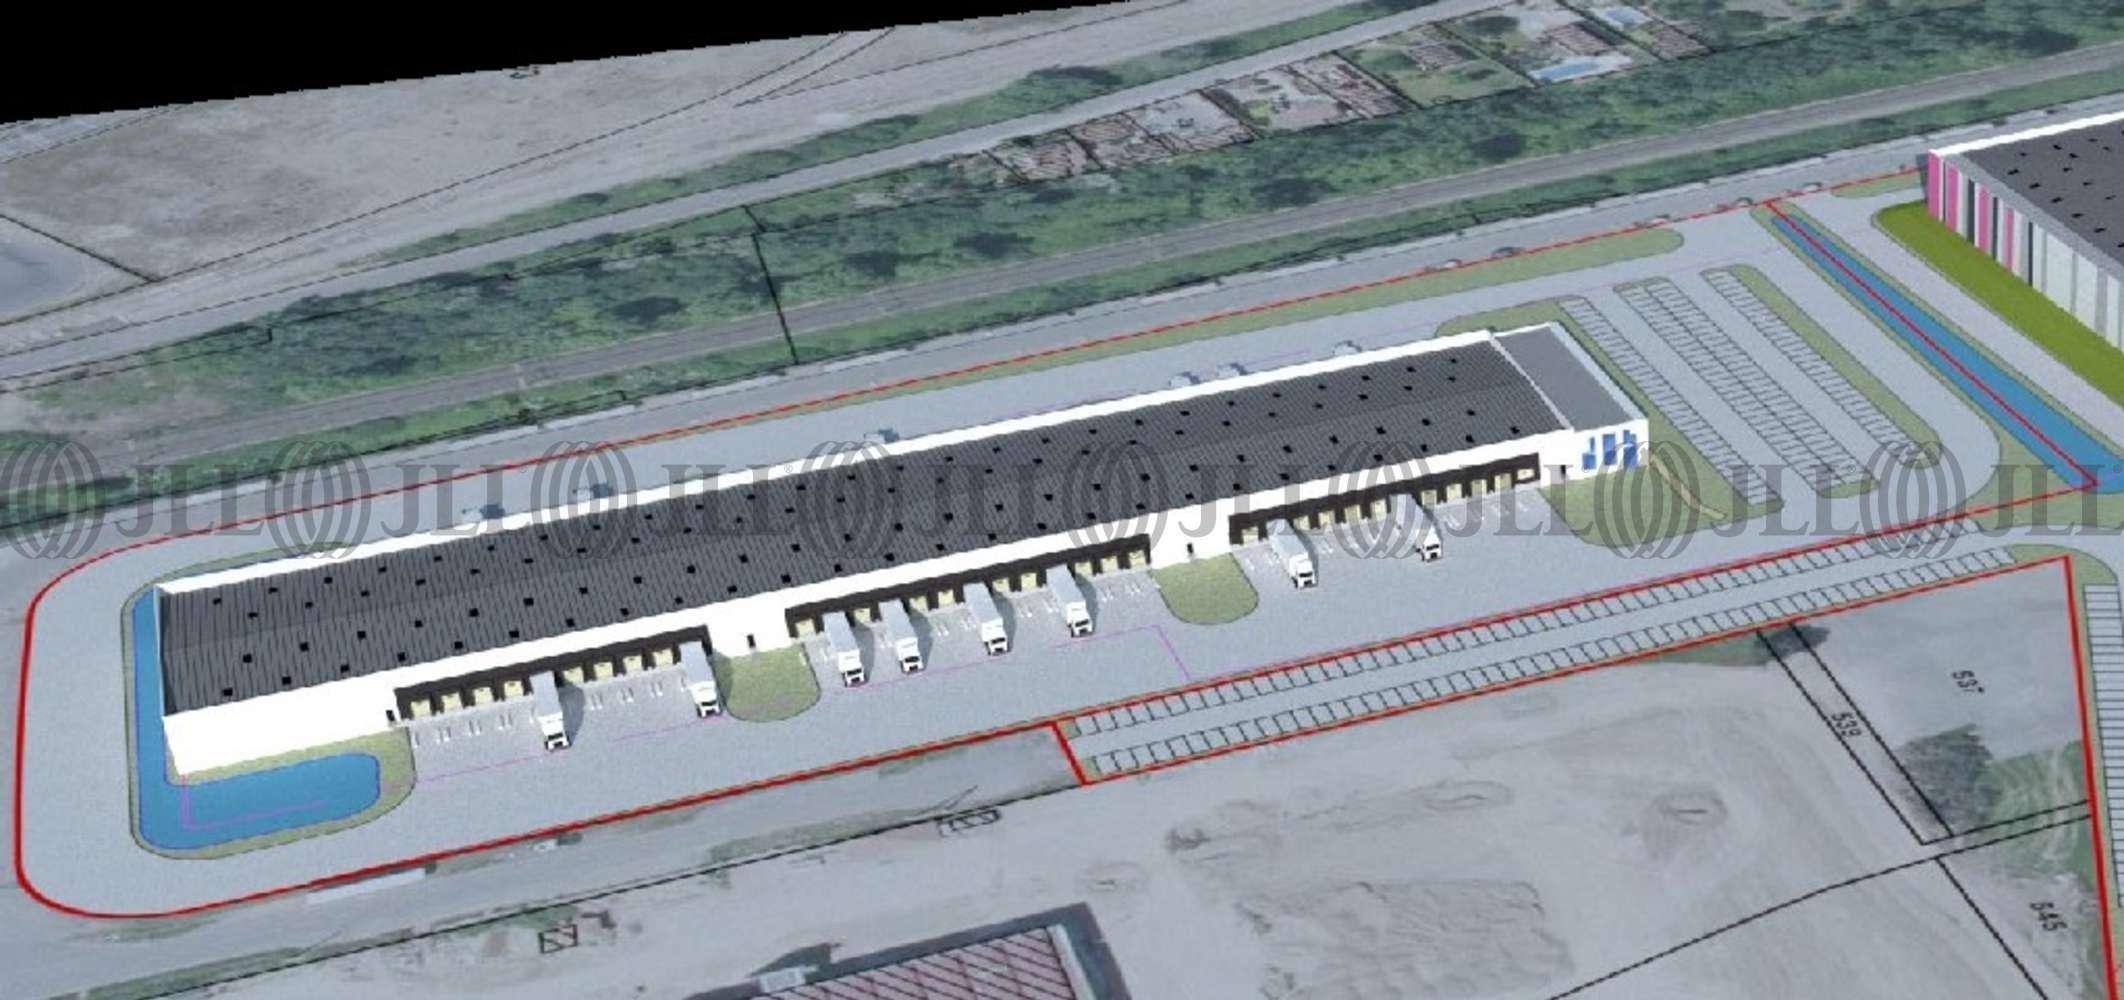 Plateformes logistiques Arles, 13200 - LOCATION ENTREPOT ARLES MARSEILLE